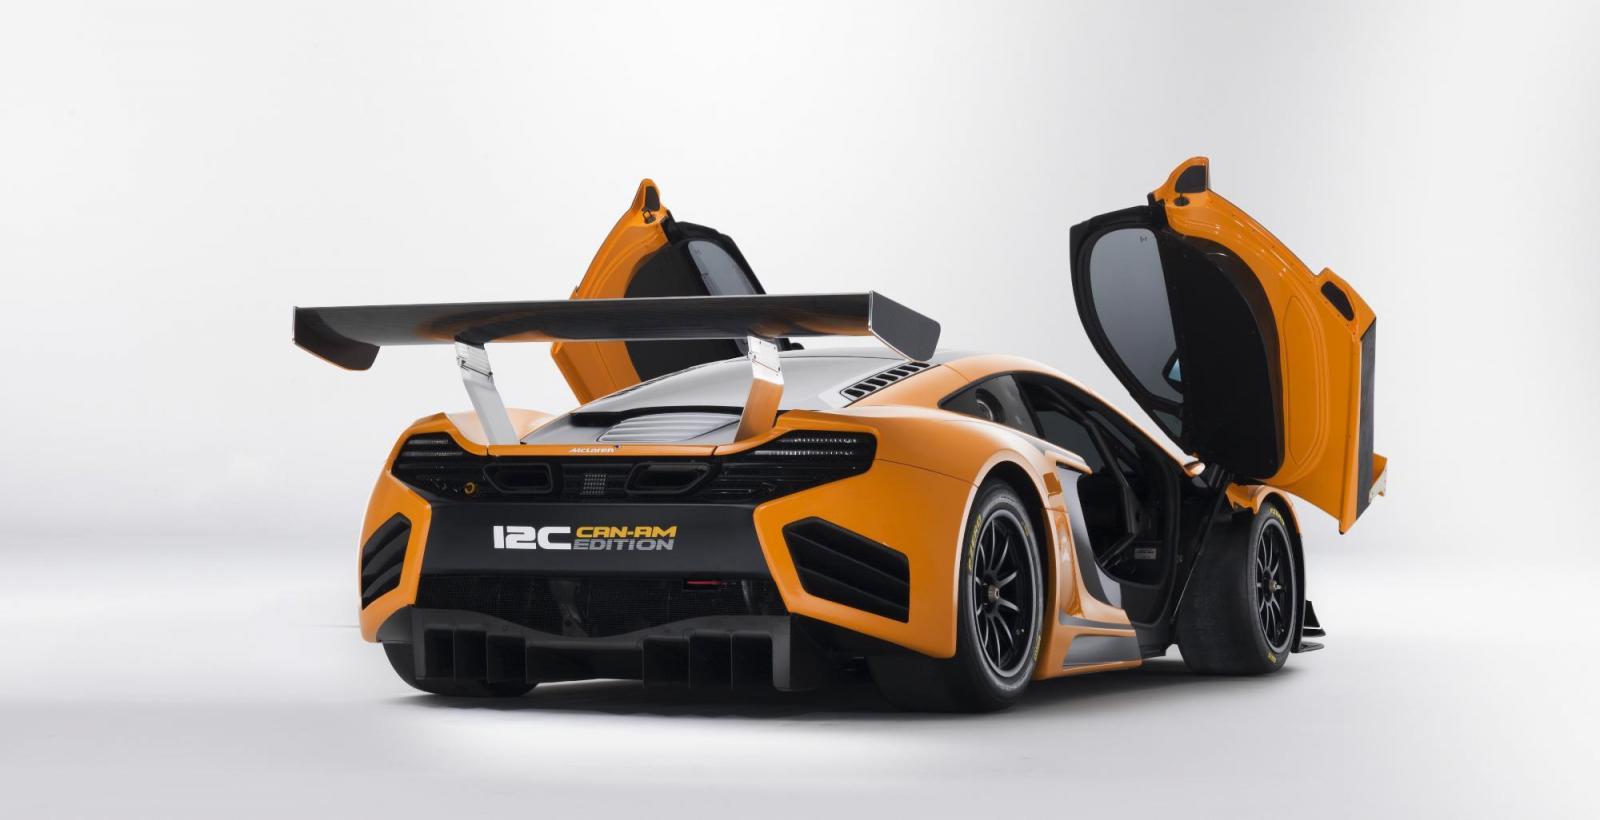 http://images.caradisiac.com/images/0/3/5/5/80355/S0-McLaren-MP4-12C-Cam-Am-Edition-Racing-Concept-268723.jpg